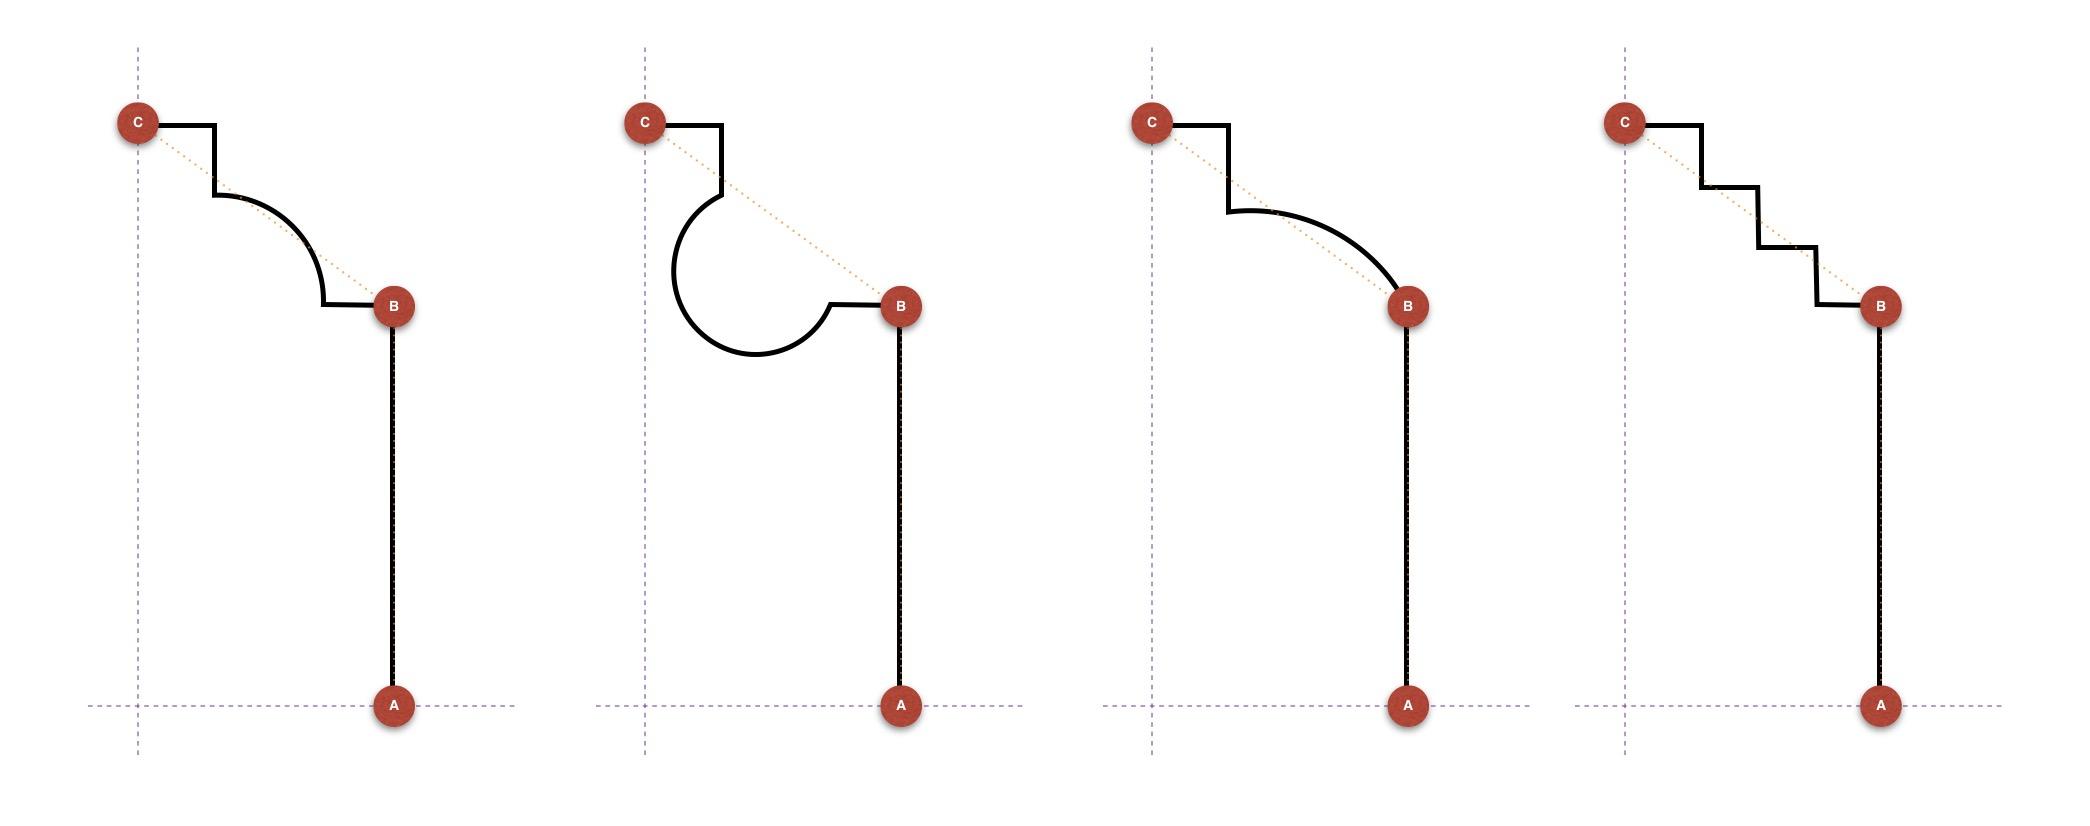 Advanced Archimatix: Creating Custom Parametric Shapes